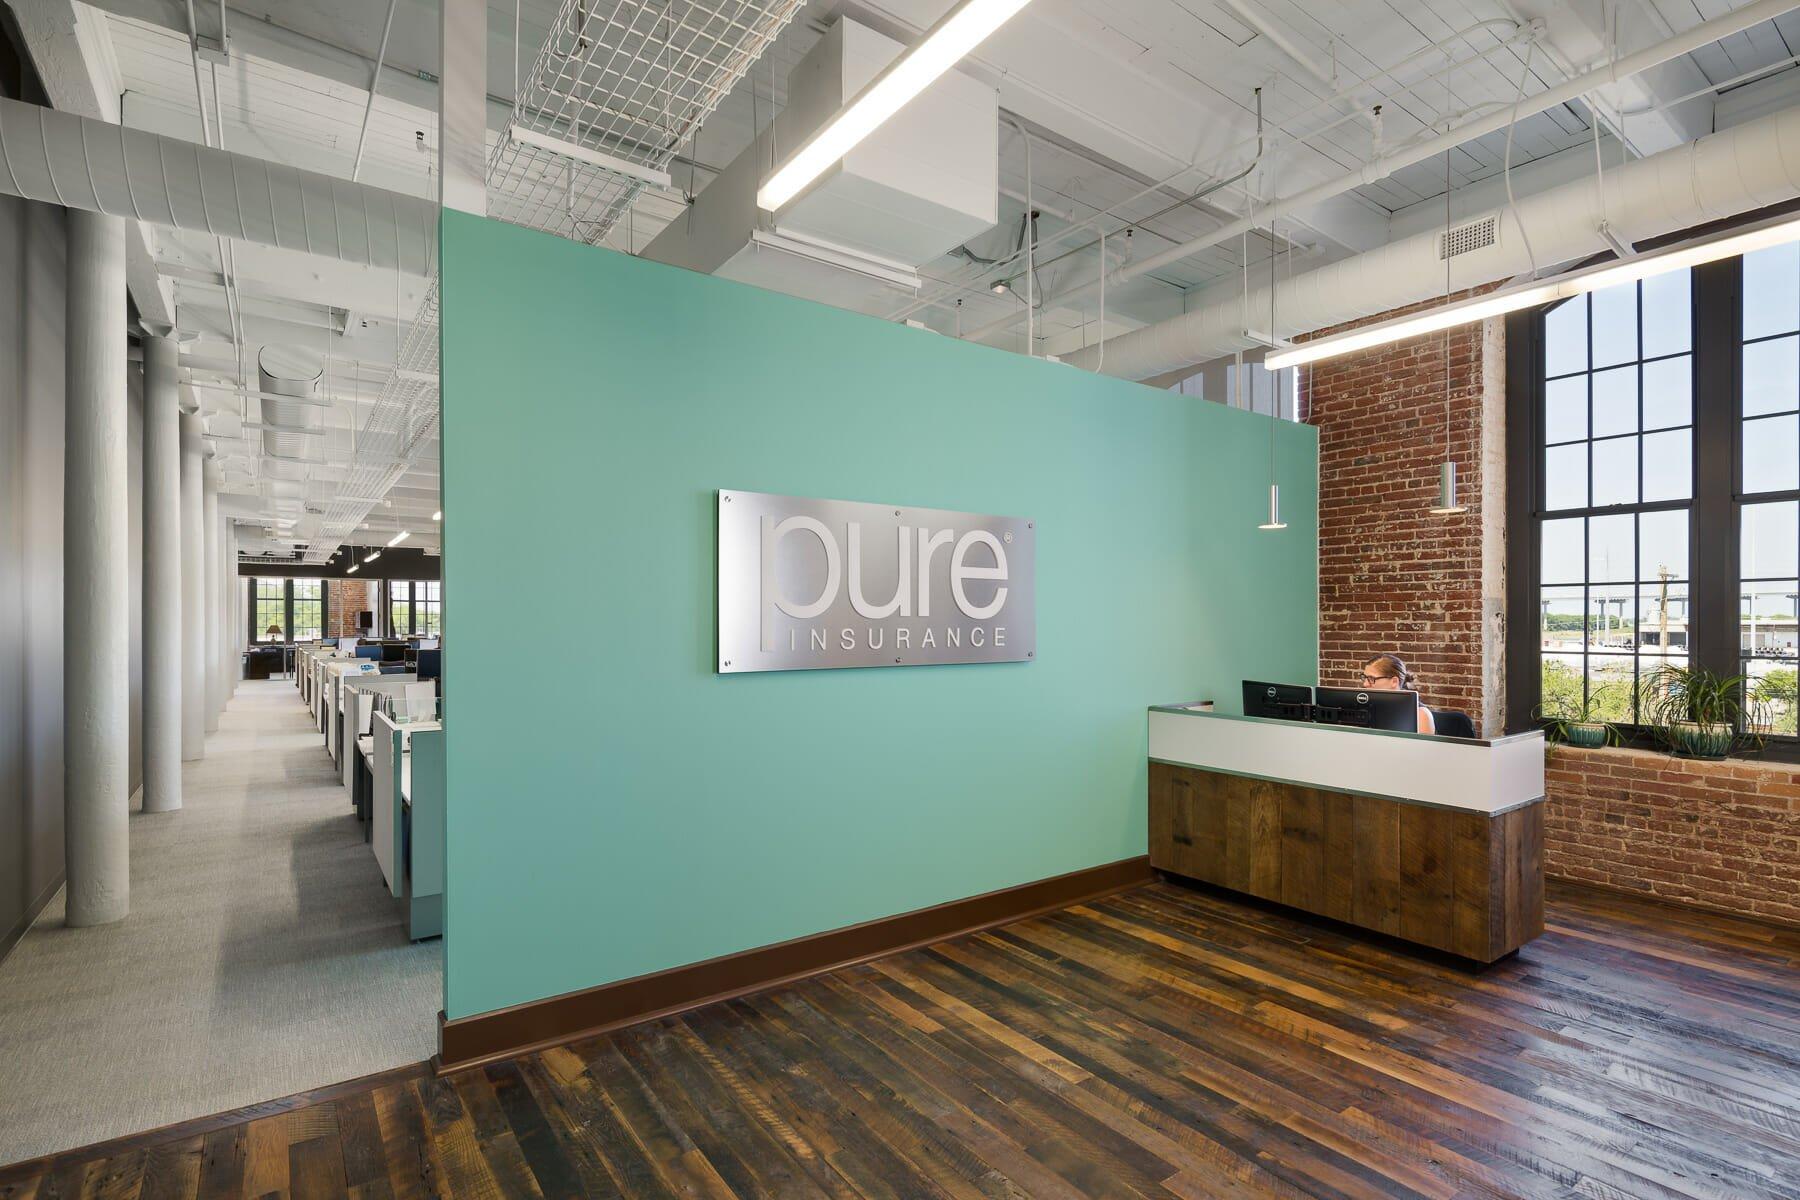 6 Best Office Interior Design Service Tips | Decorilla